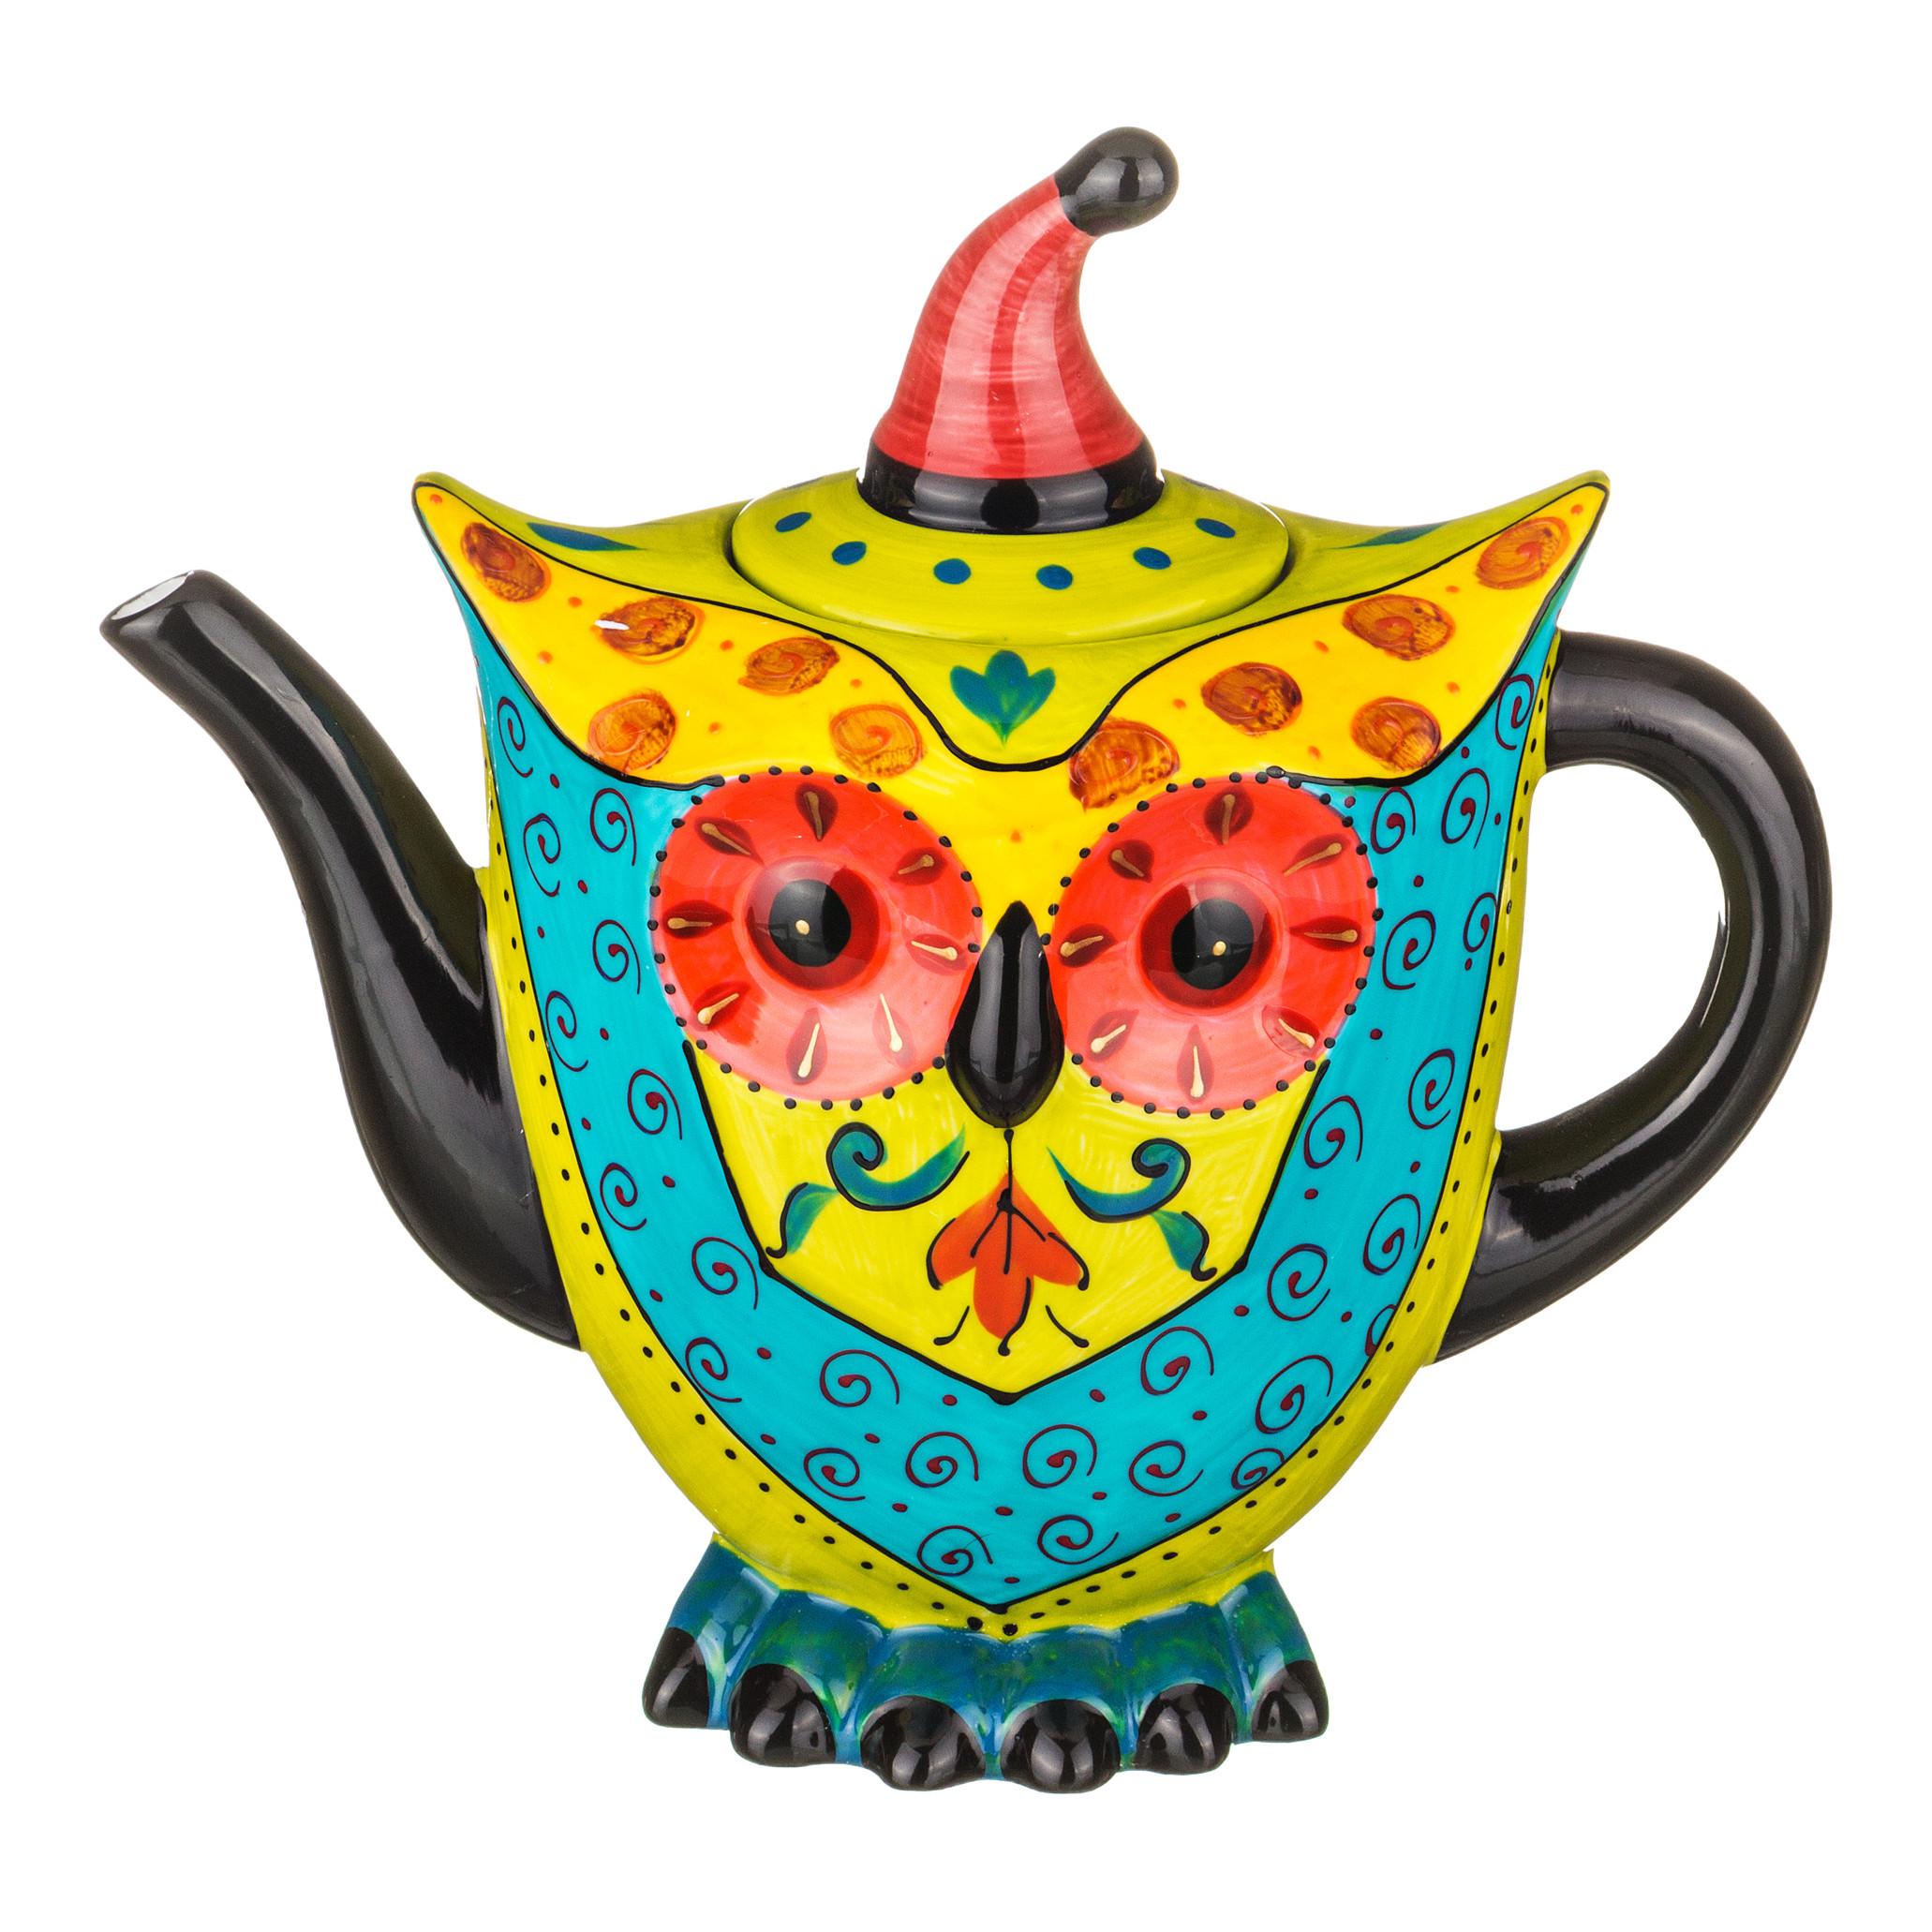 {} Lefard Заварочный чайник Совенок (1200 мл) заварочный чайник lilac wg74